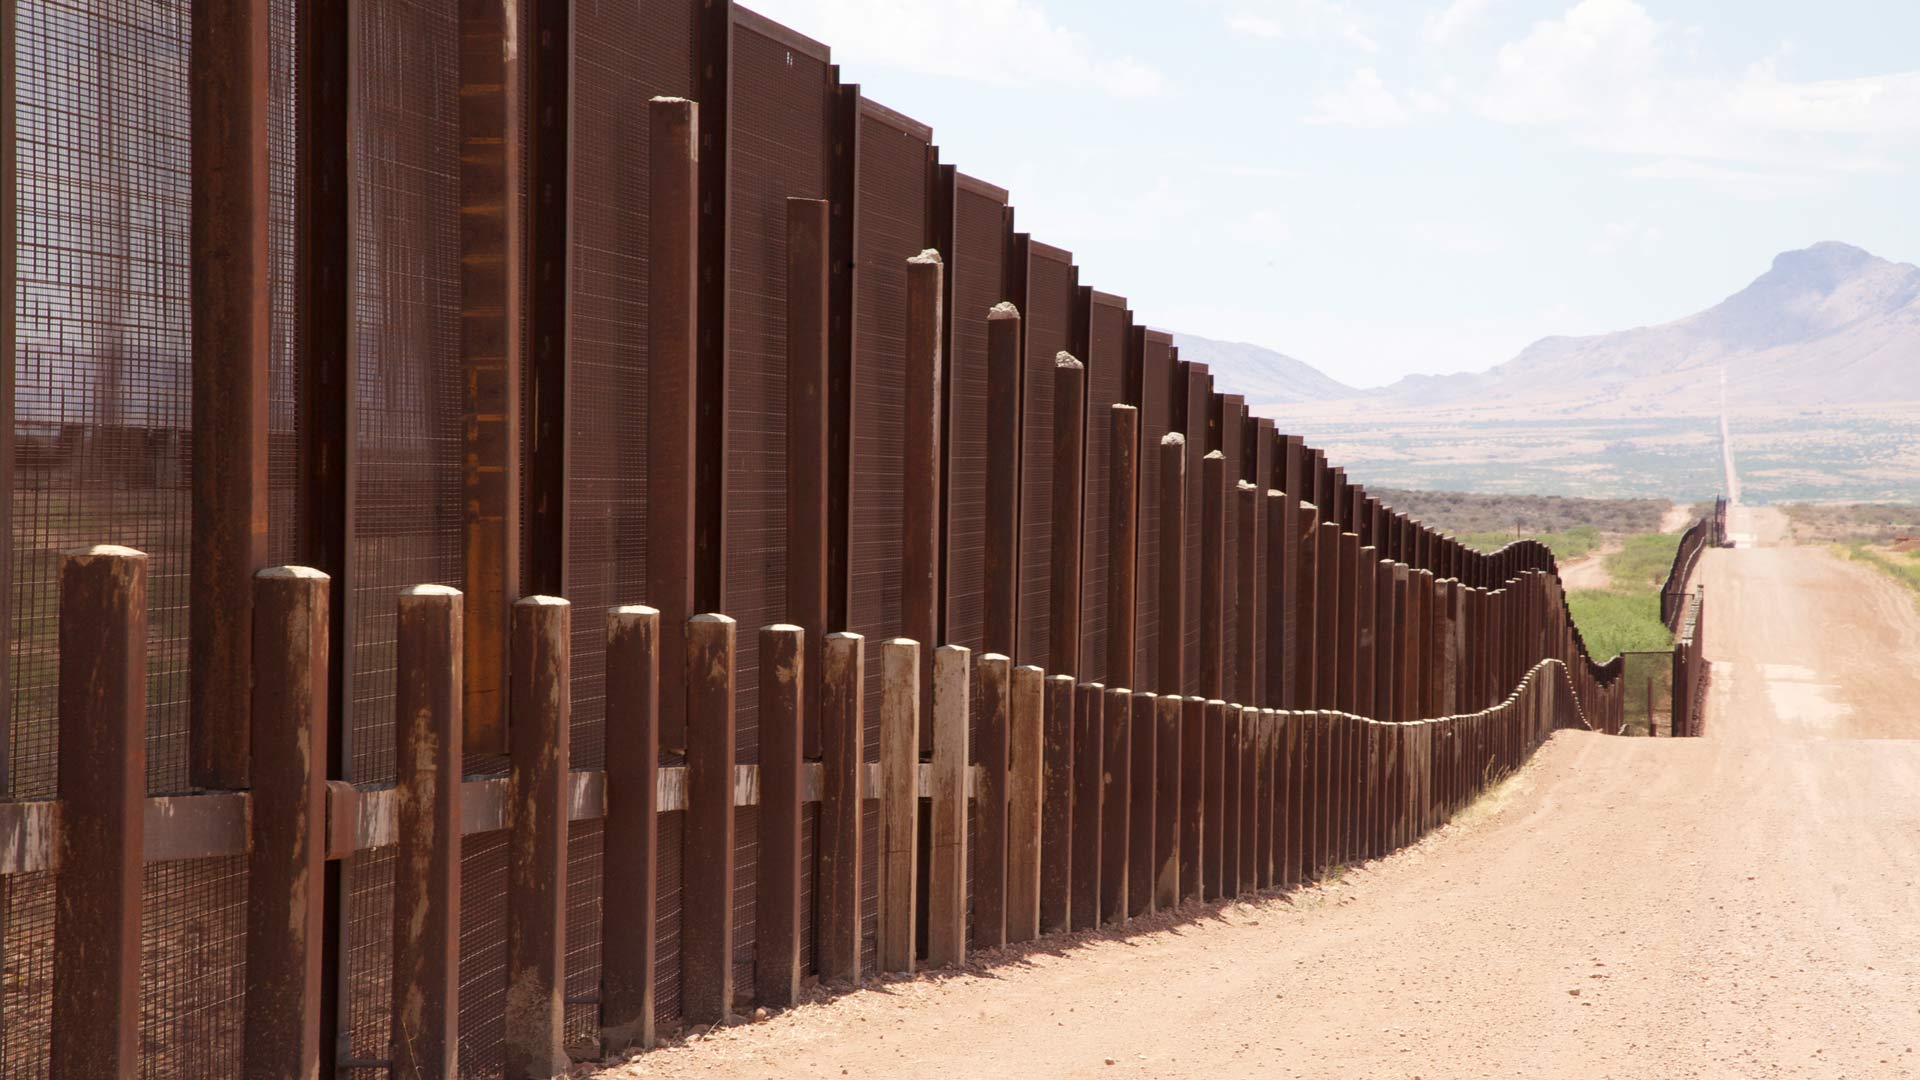 U.S. Border Wall, Illegal Immigration hero